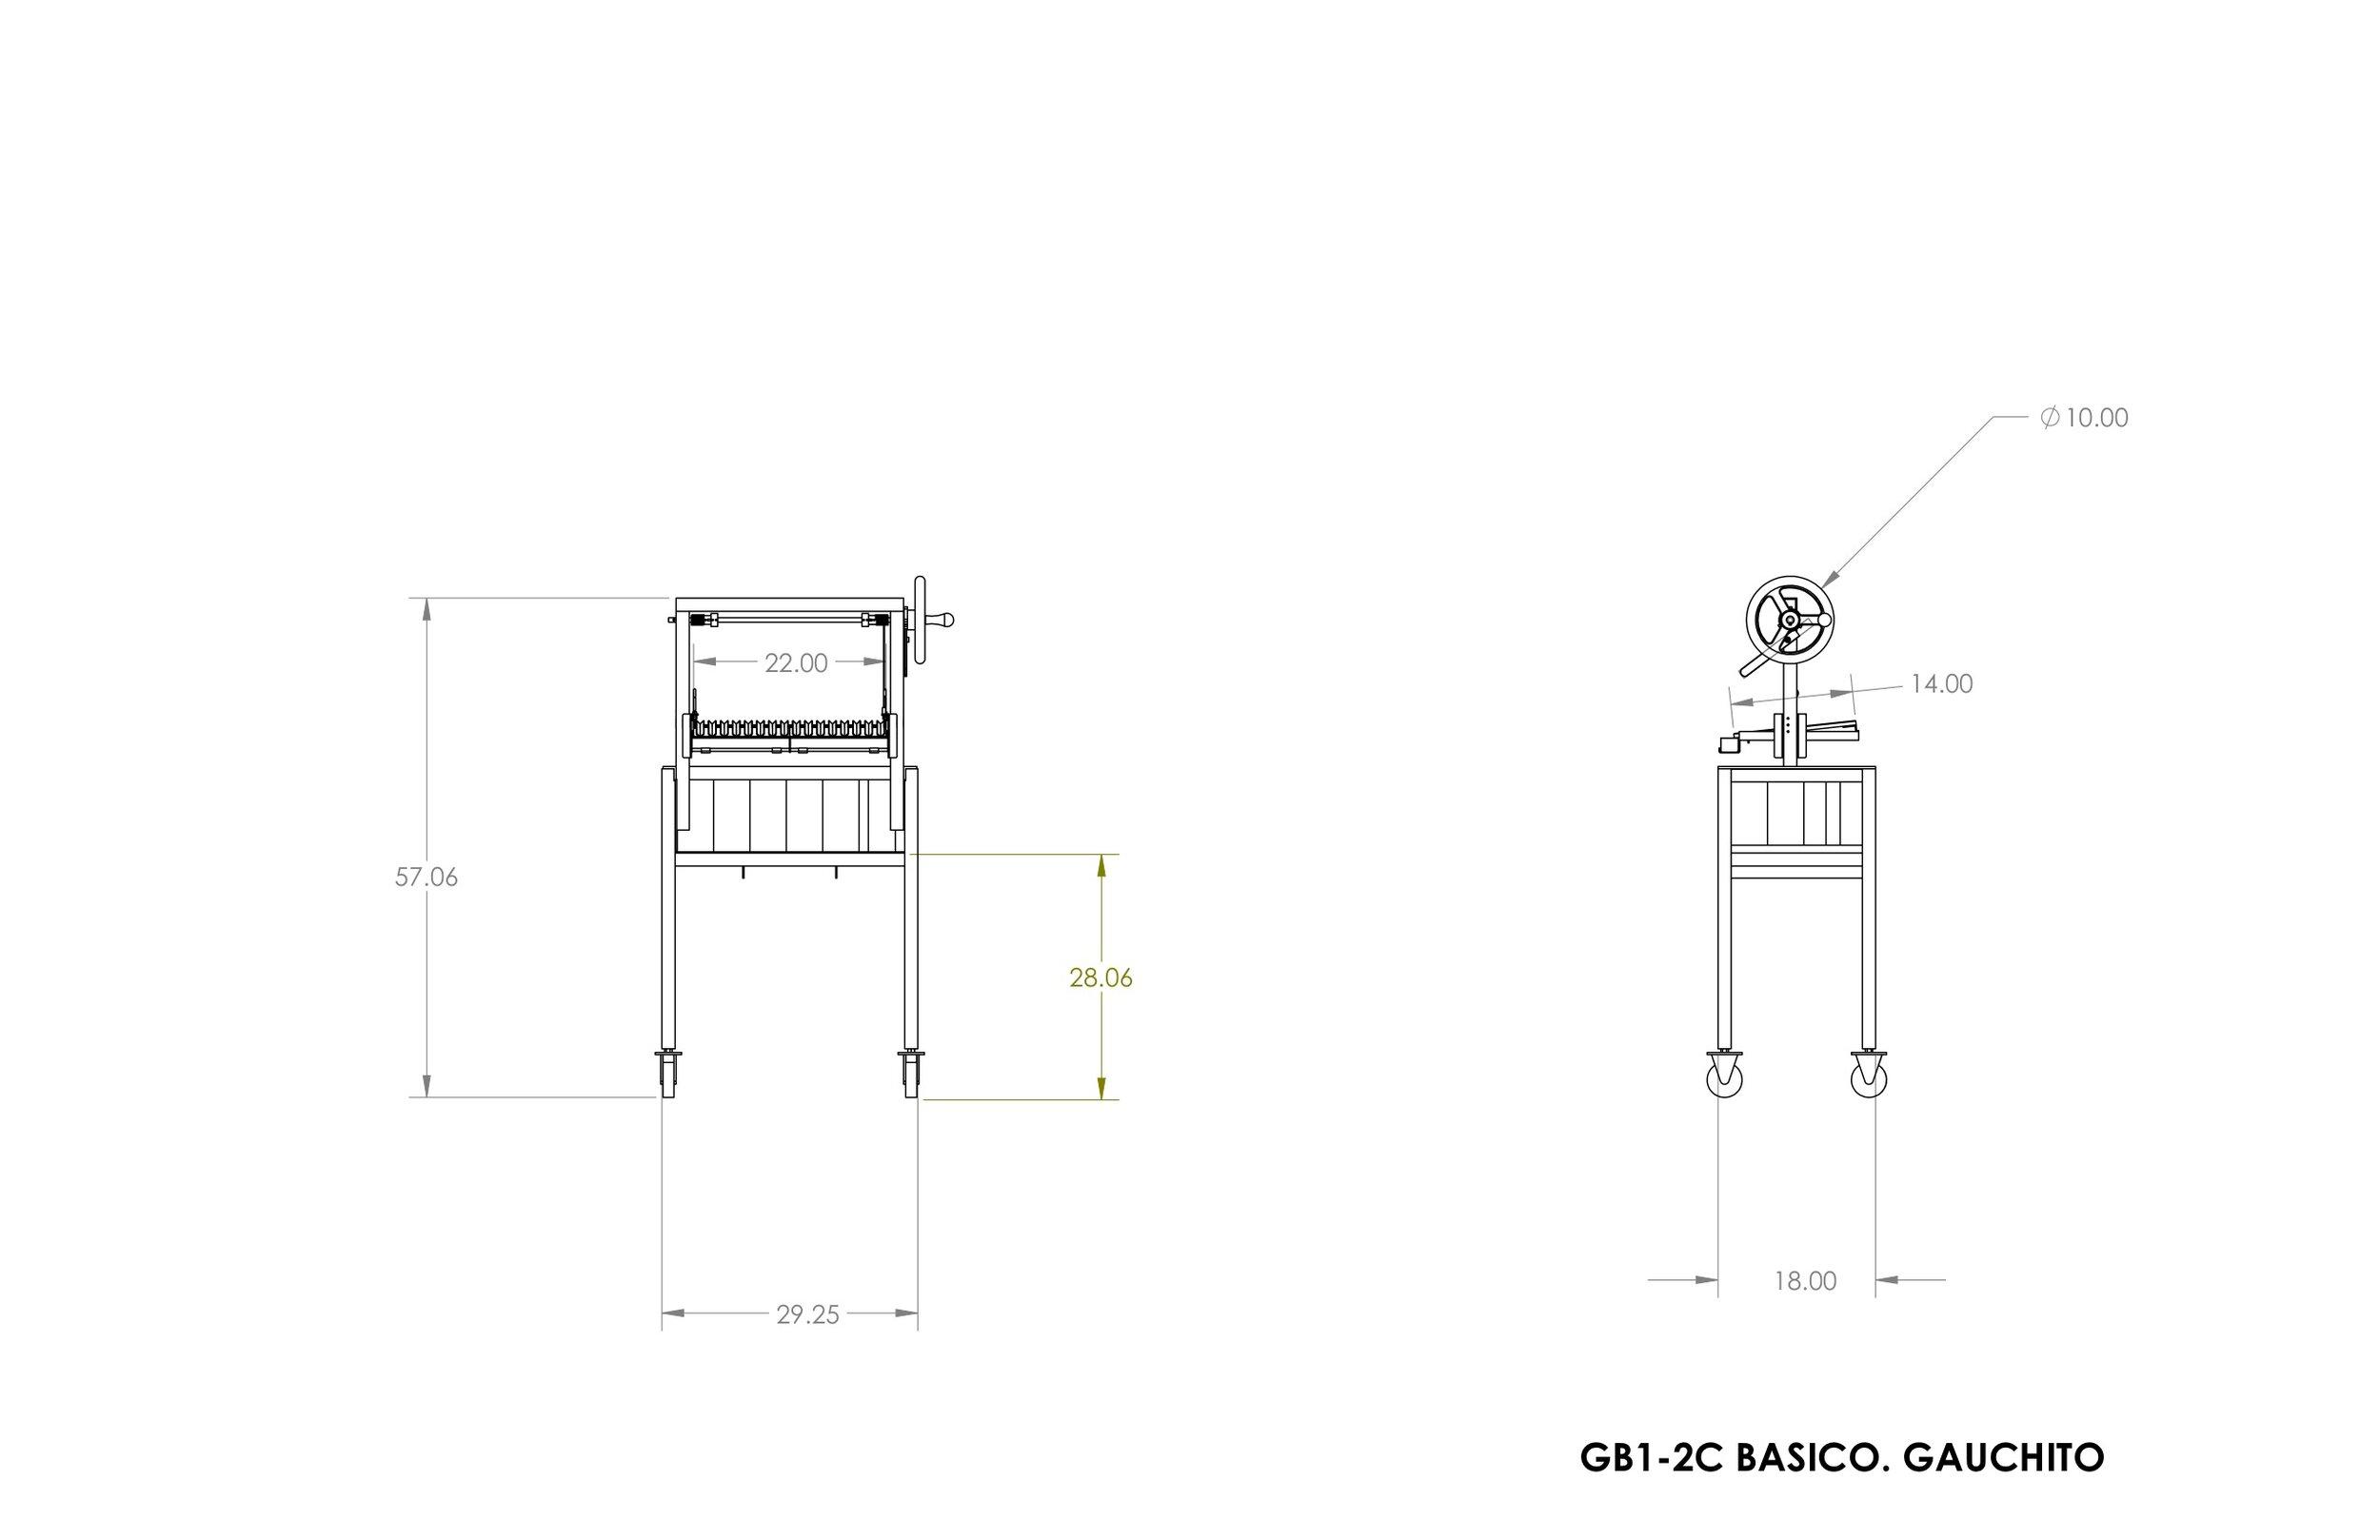 GB1-2C BASICO, GAUCHITO 2.jpg